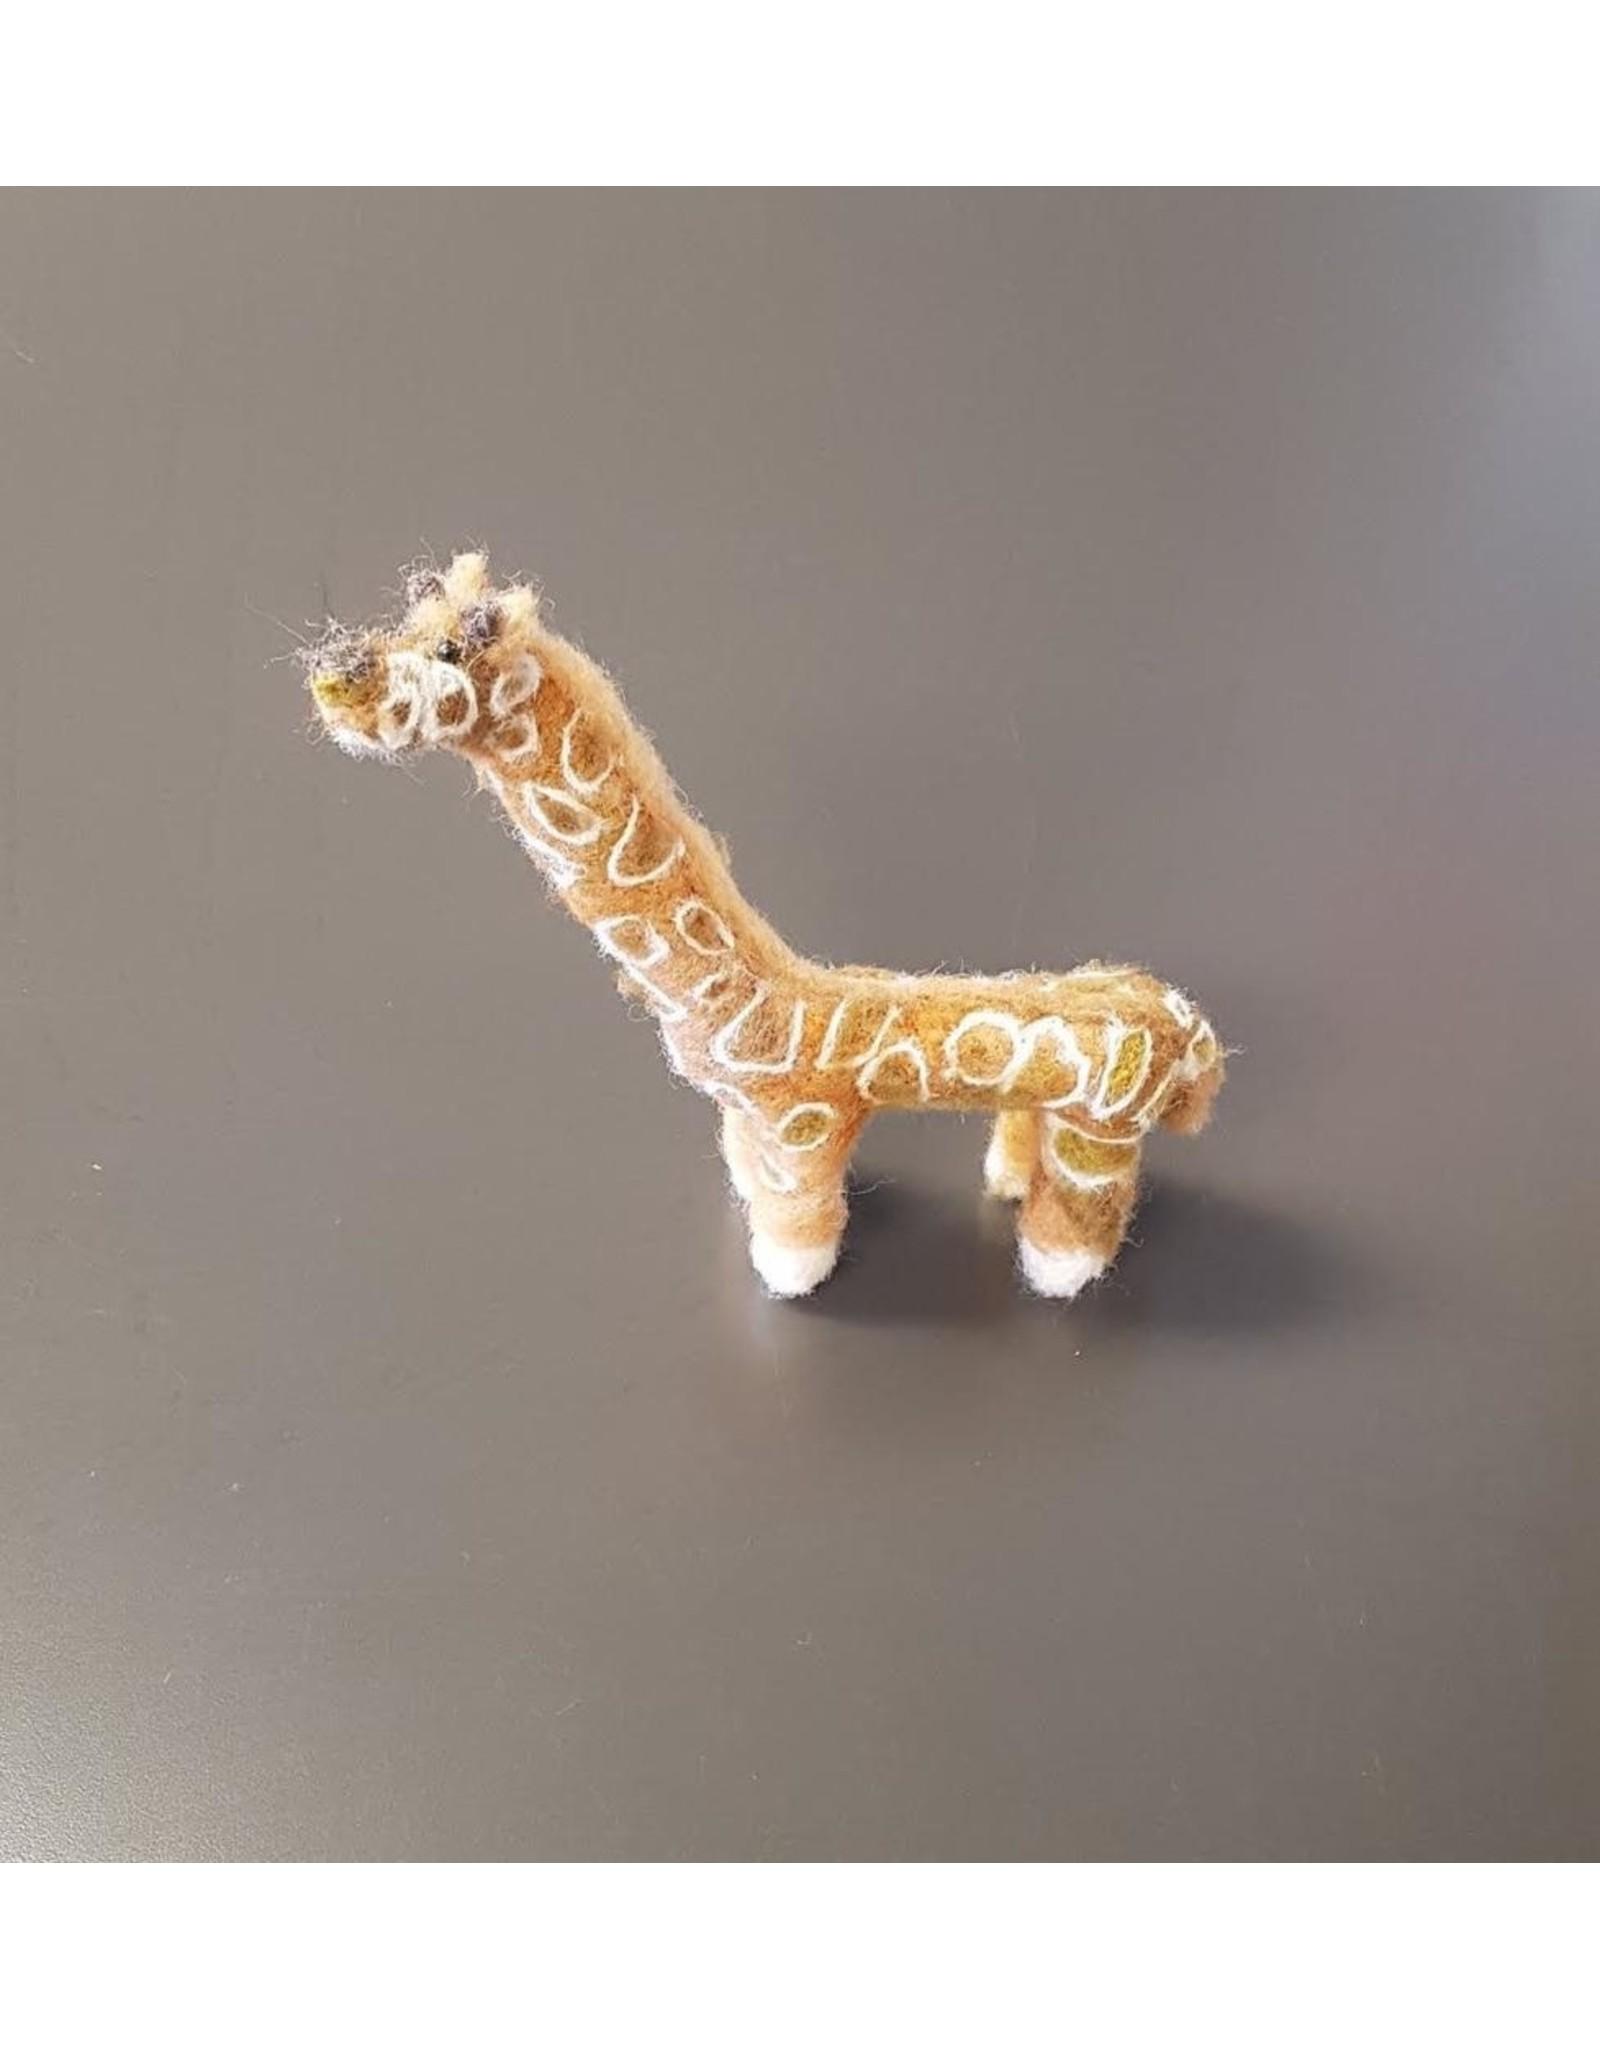 Dzama, Jeanette & Maurice Baby Giraffe, Needle Felted Animal by Jeanette and Maurice Dzama